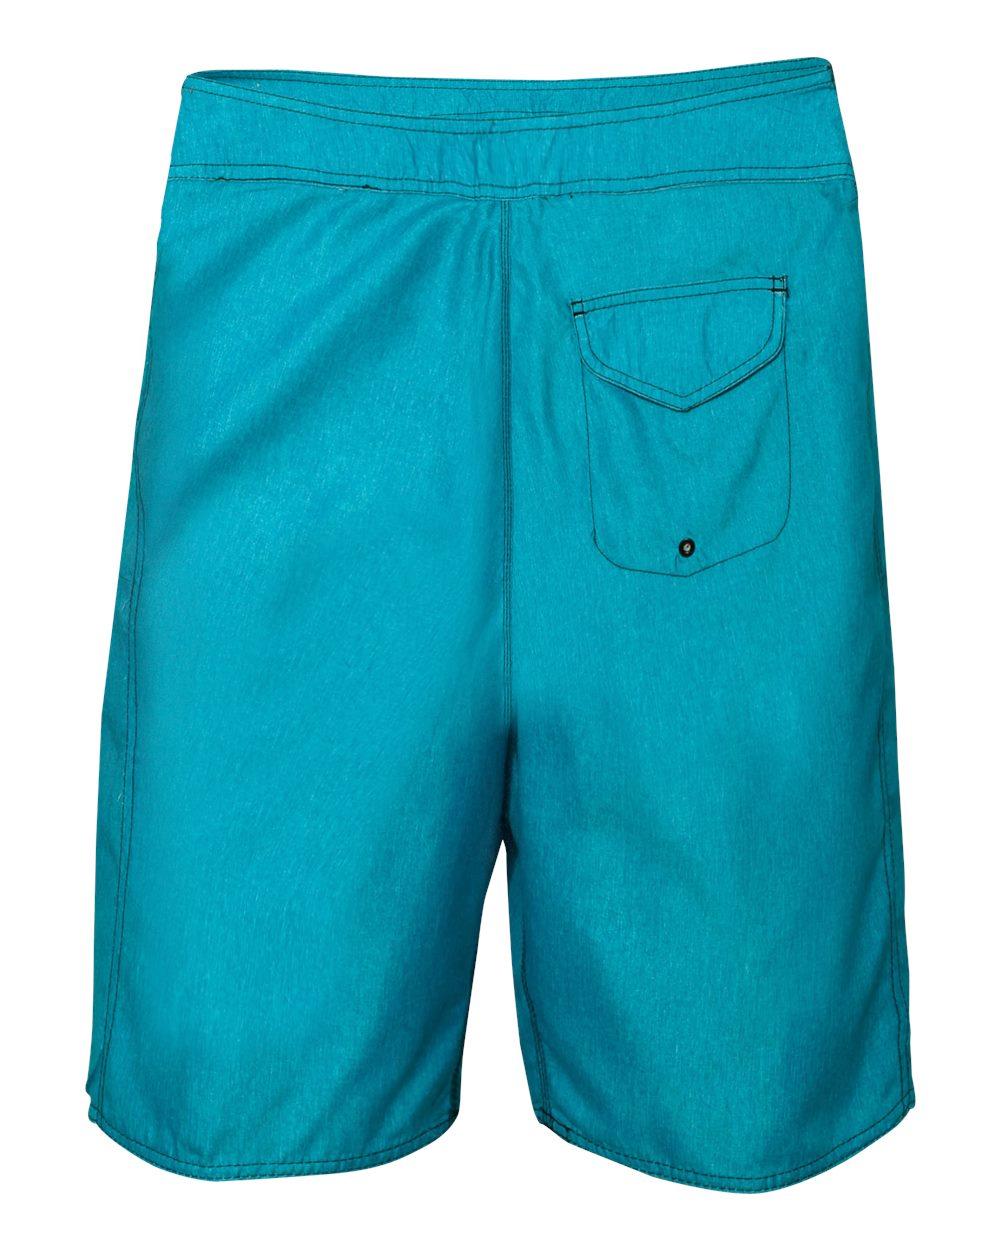 Burnside-Men-039-s-Heathered-Board-Shorts-B9305-30-40 thumbnail 4